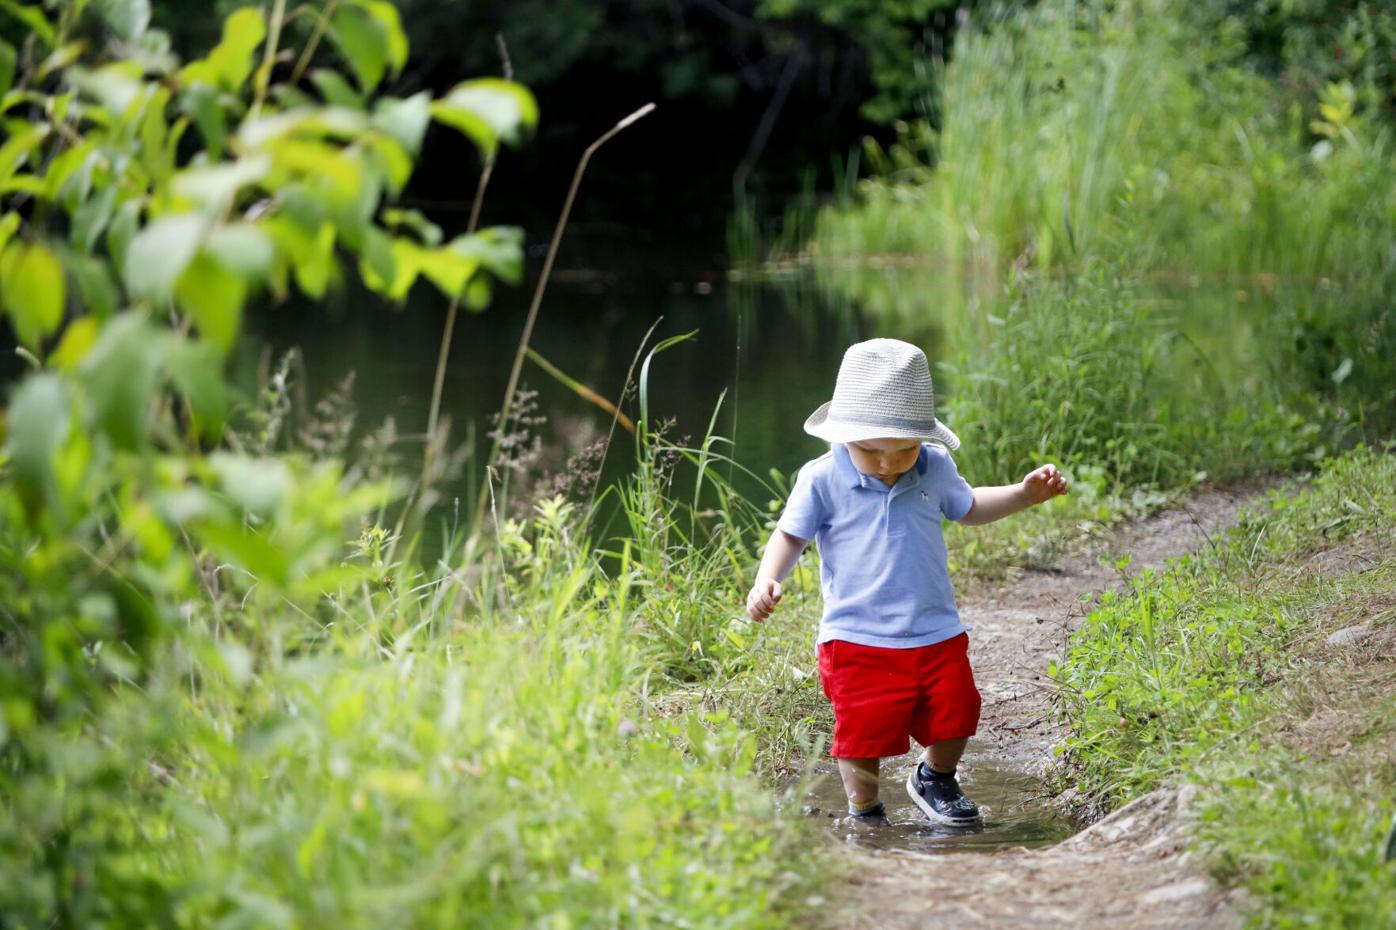 small boy walks through puddle